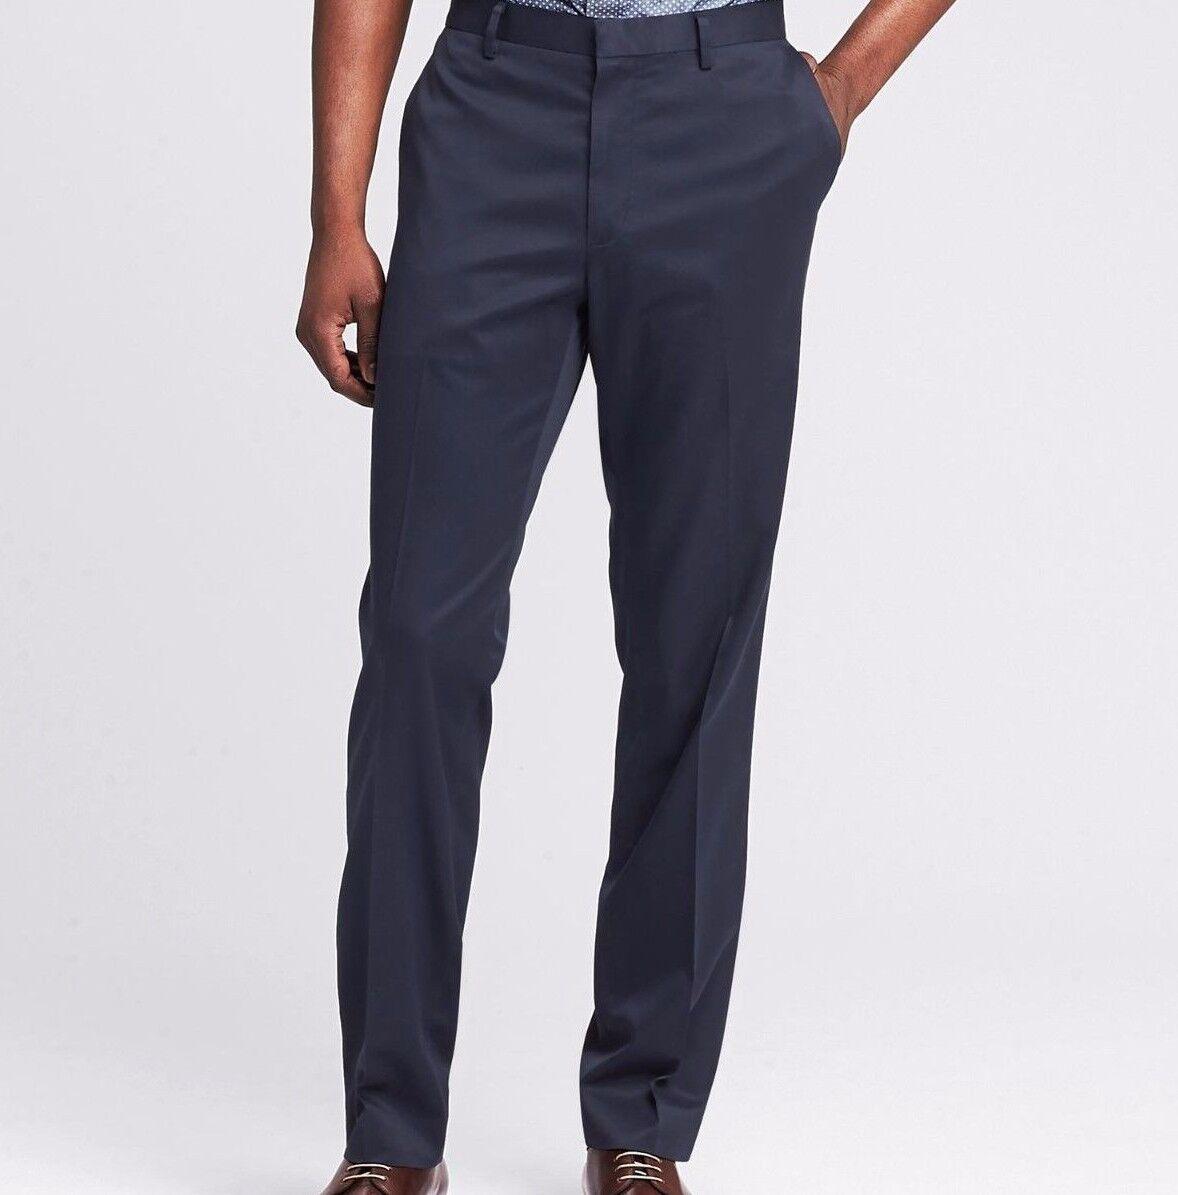 Banana Republic Modern Slim Non-Iron Cotton Pant, Navy SZ 42 X 32  v722